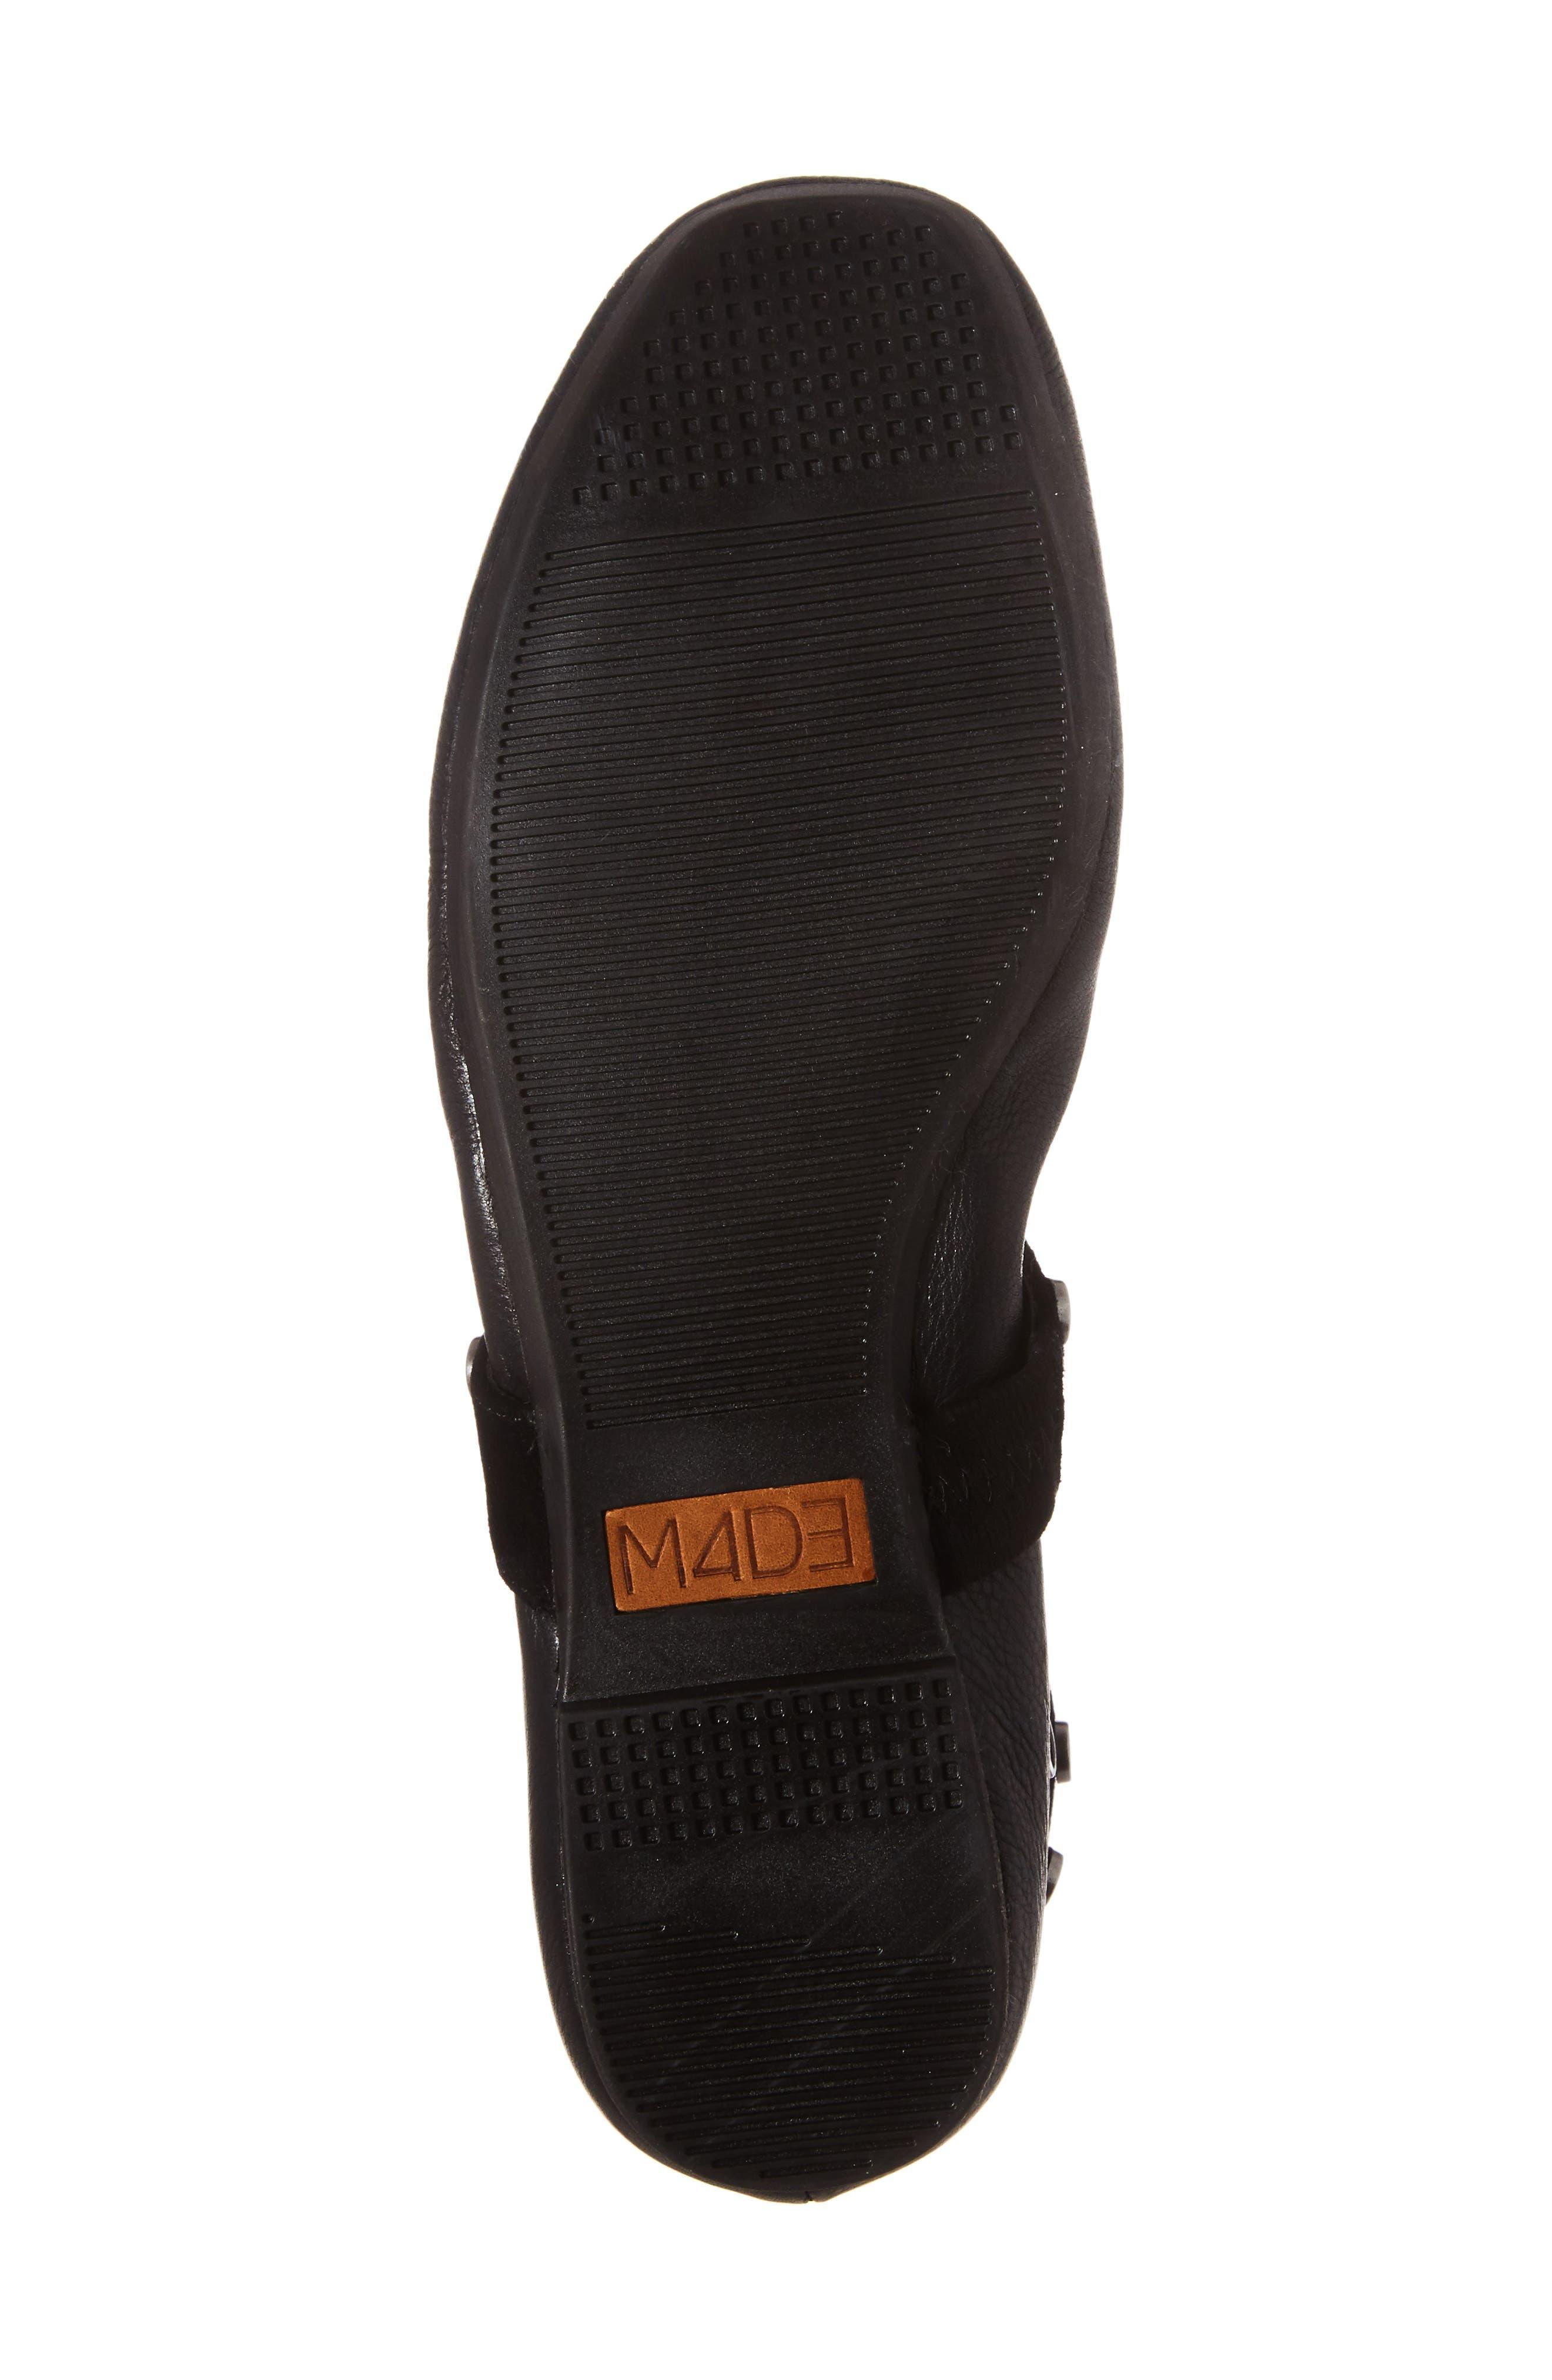 M4D3 Carla Wraparound Ankle Strap Flat,                             Alternate thumbnail 6, color,                             001